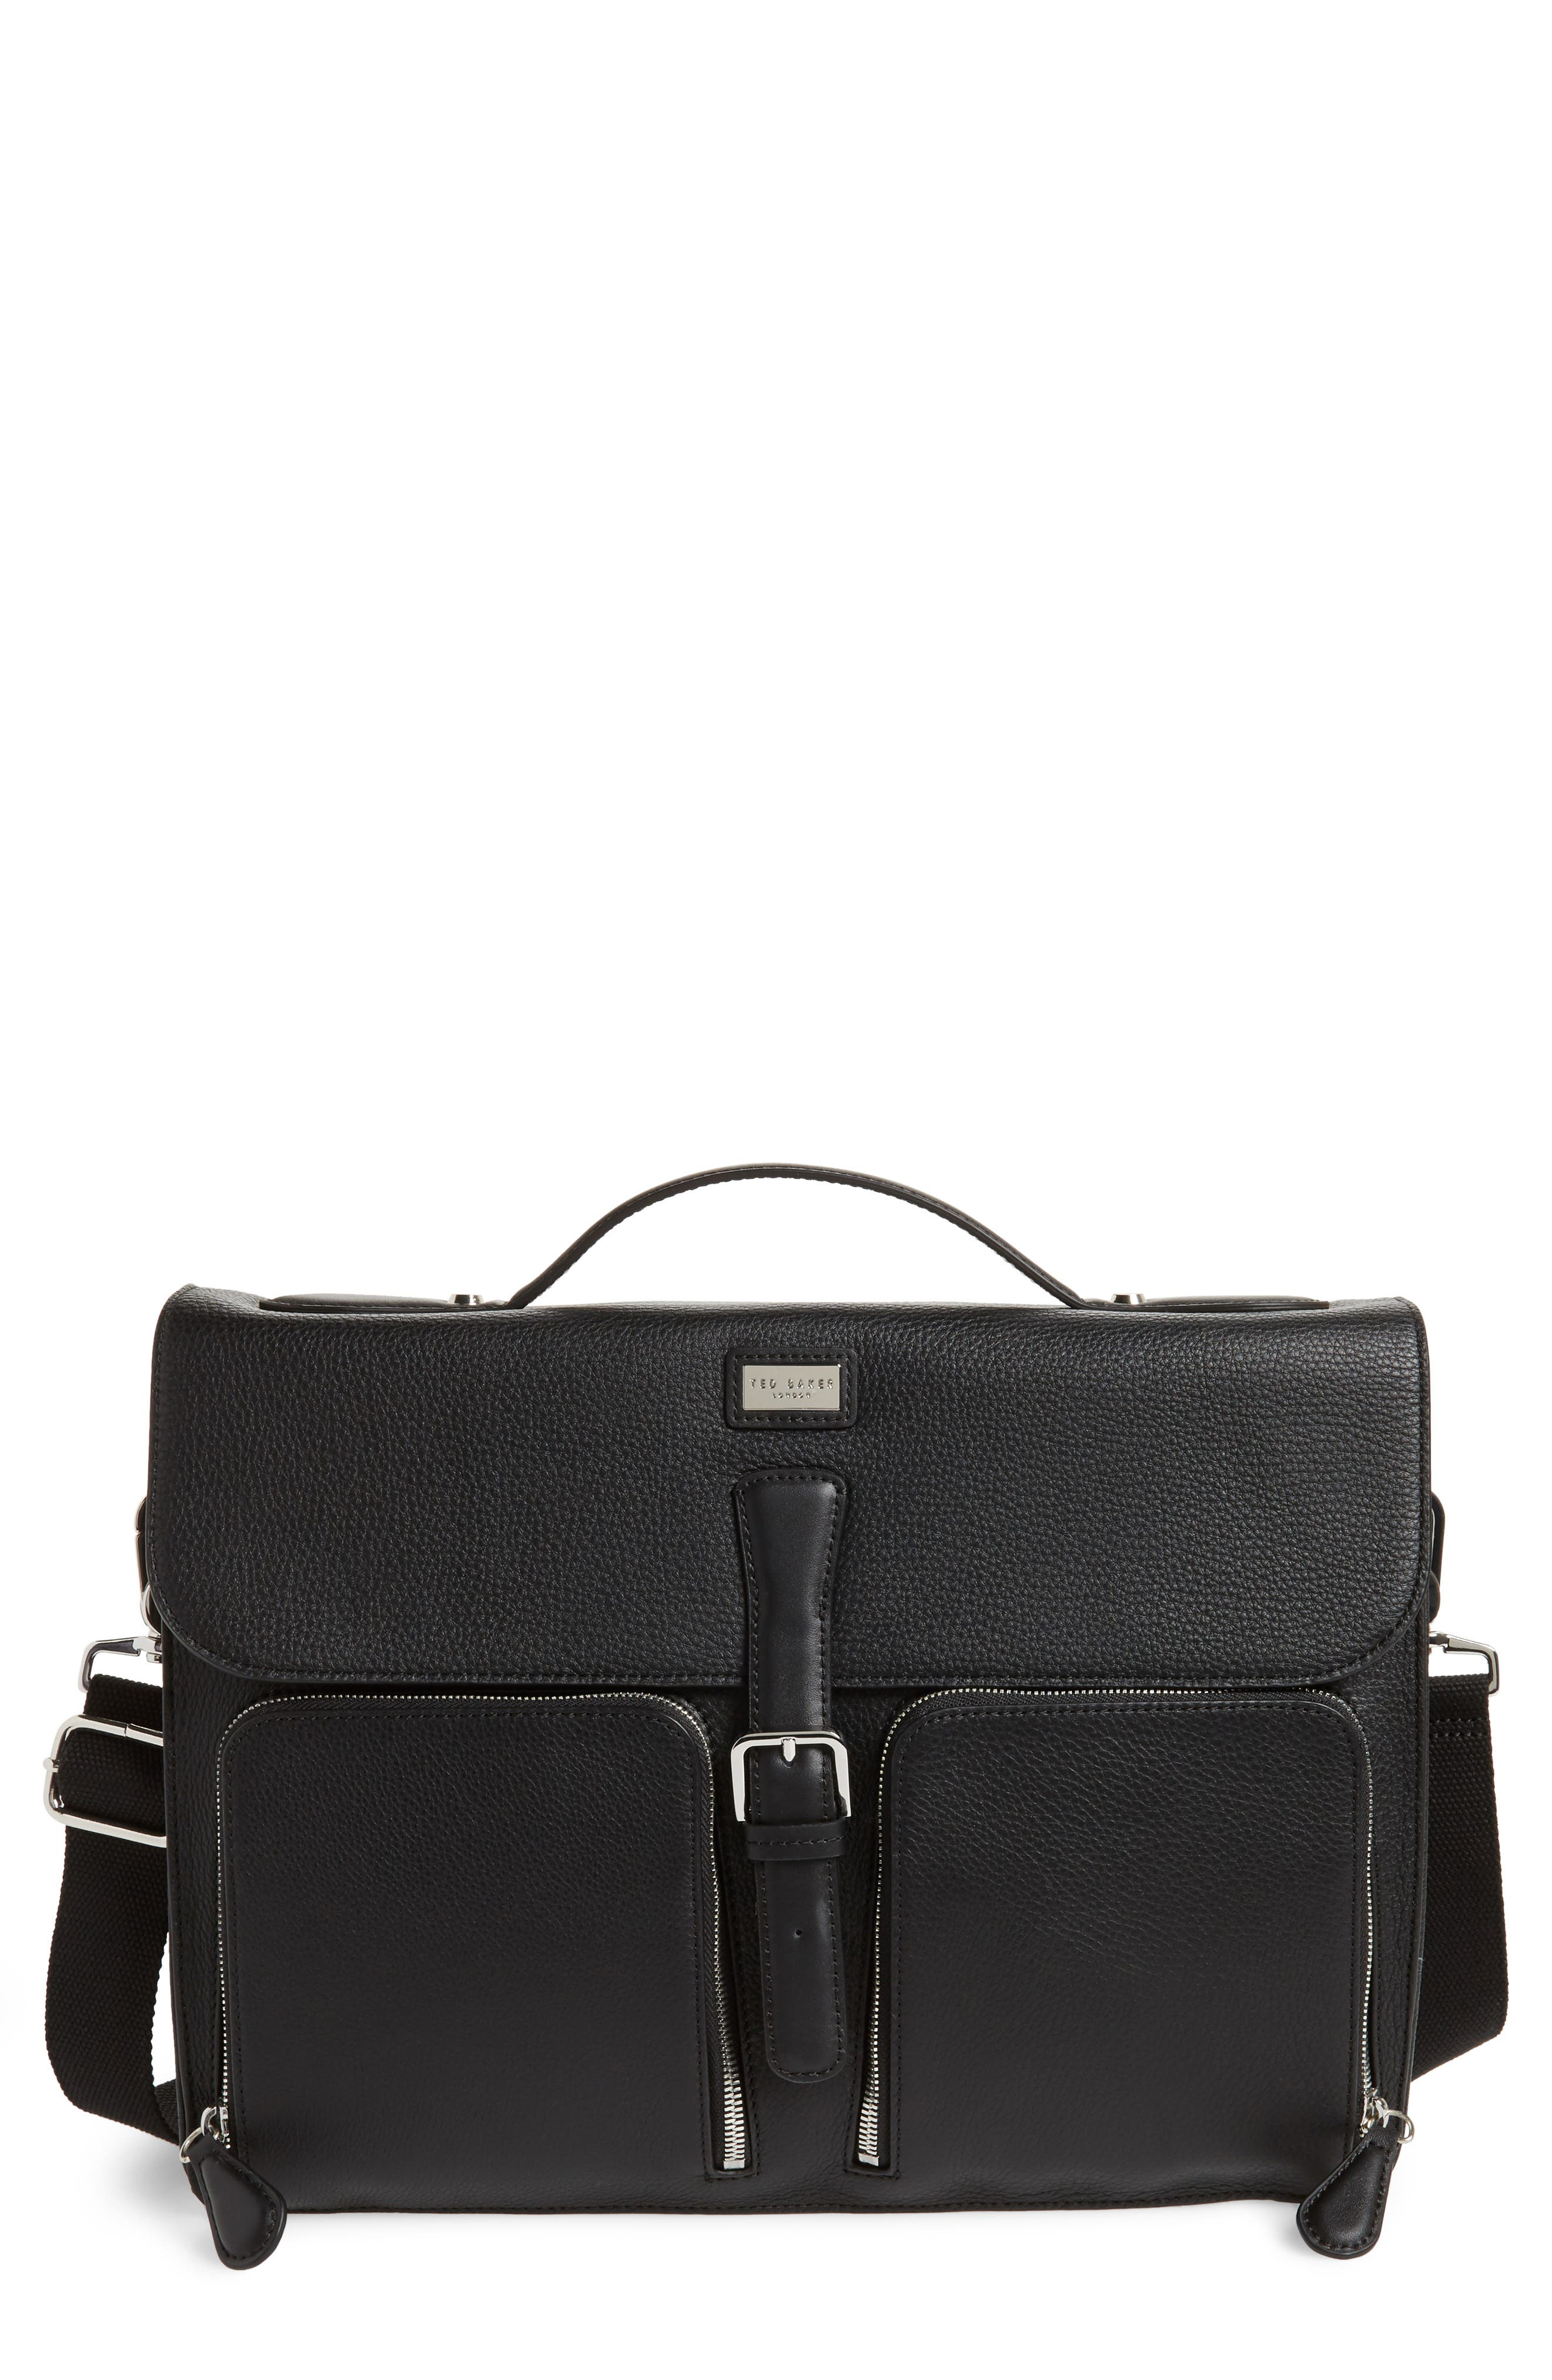 Munch Leather Satchel Briefcase,                             Main thumbnail 1, color,                             Black